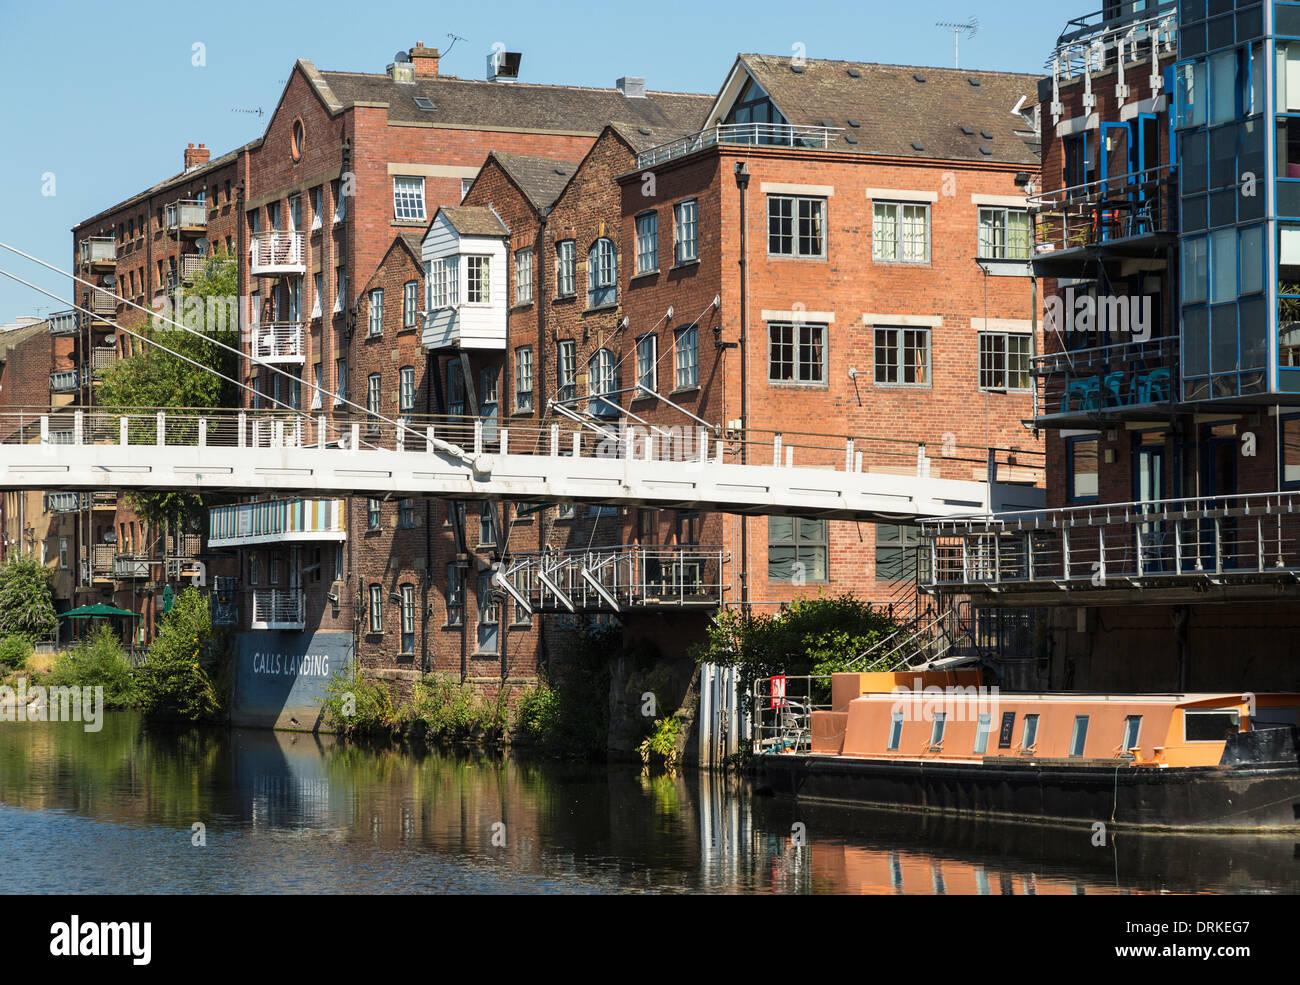 Centenary Bridge River Aire at The Calls, Leeds, England - Stock Image